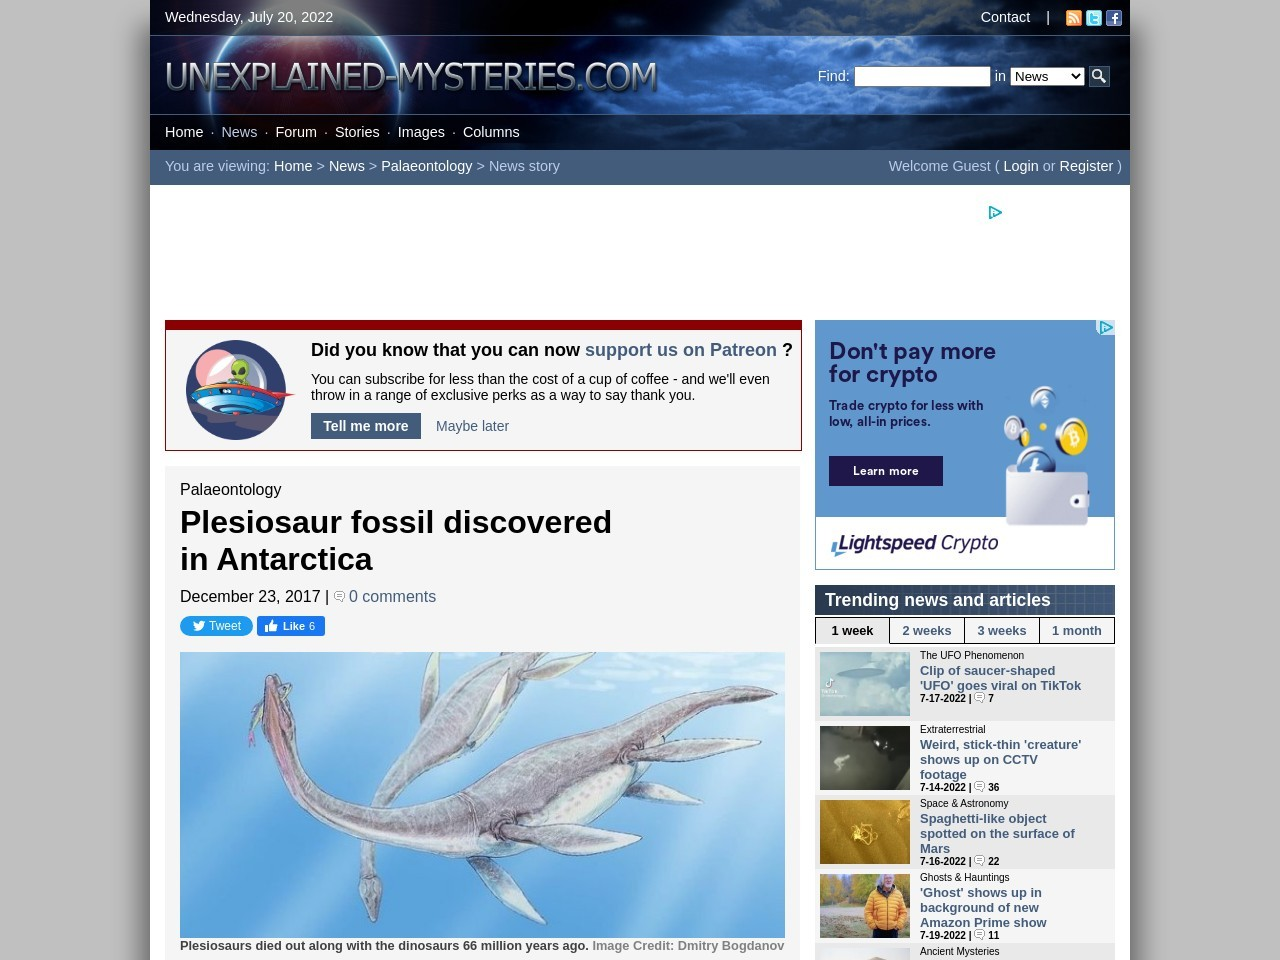 Plesiosaur fossil discovered in Antarctica